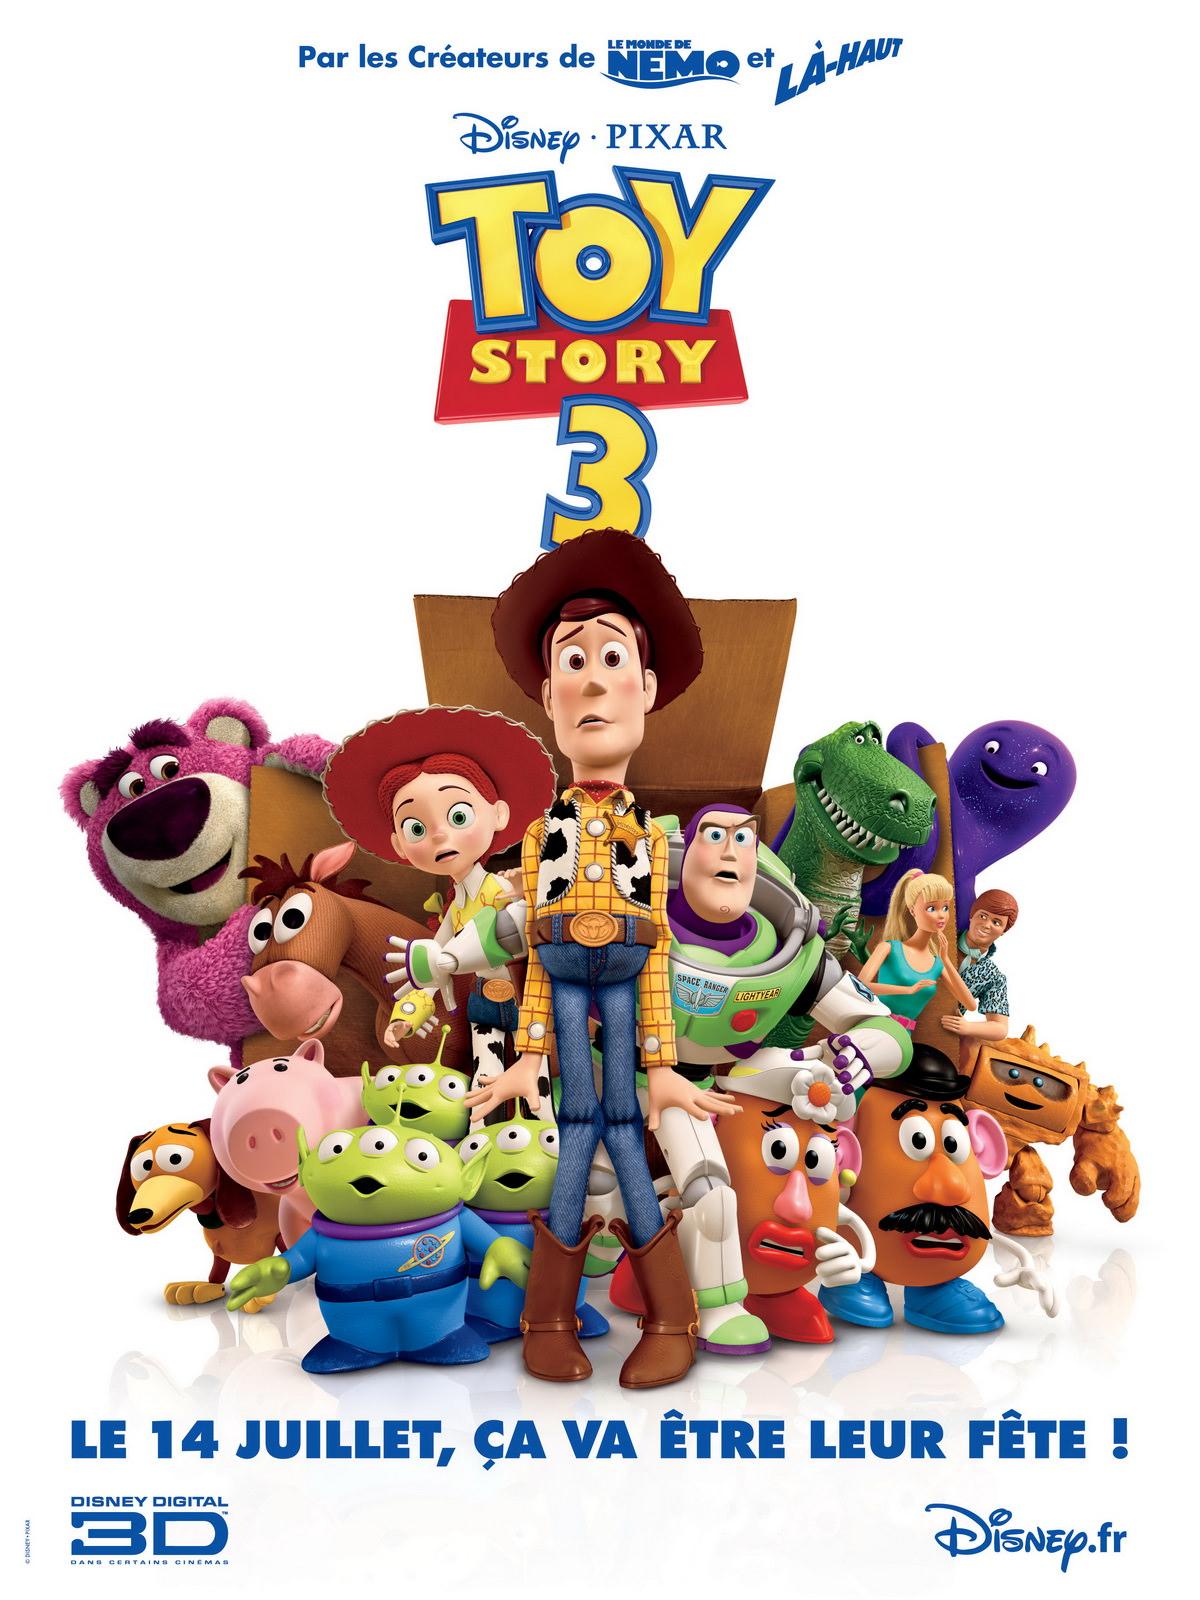 pixar-toy-story-3-2010